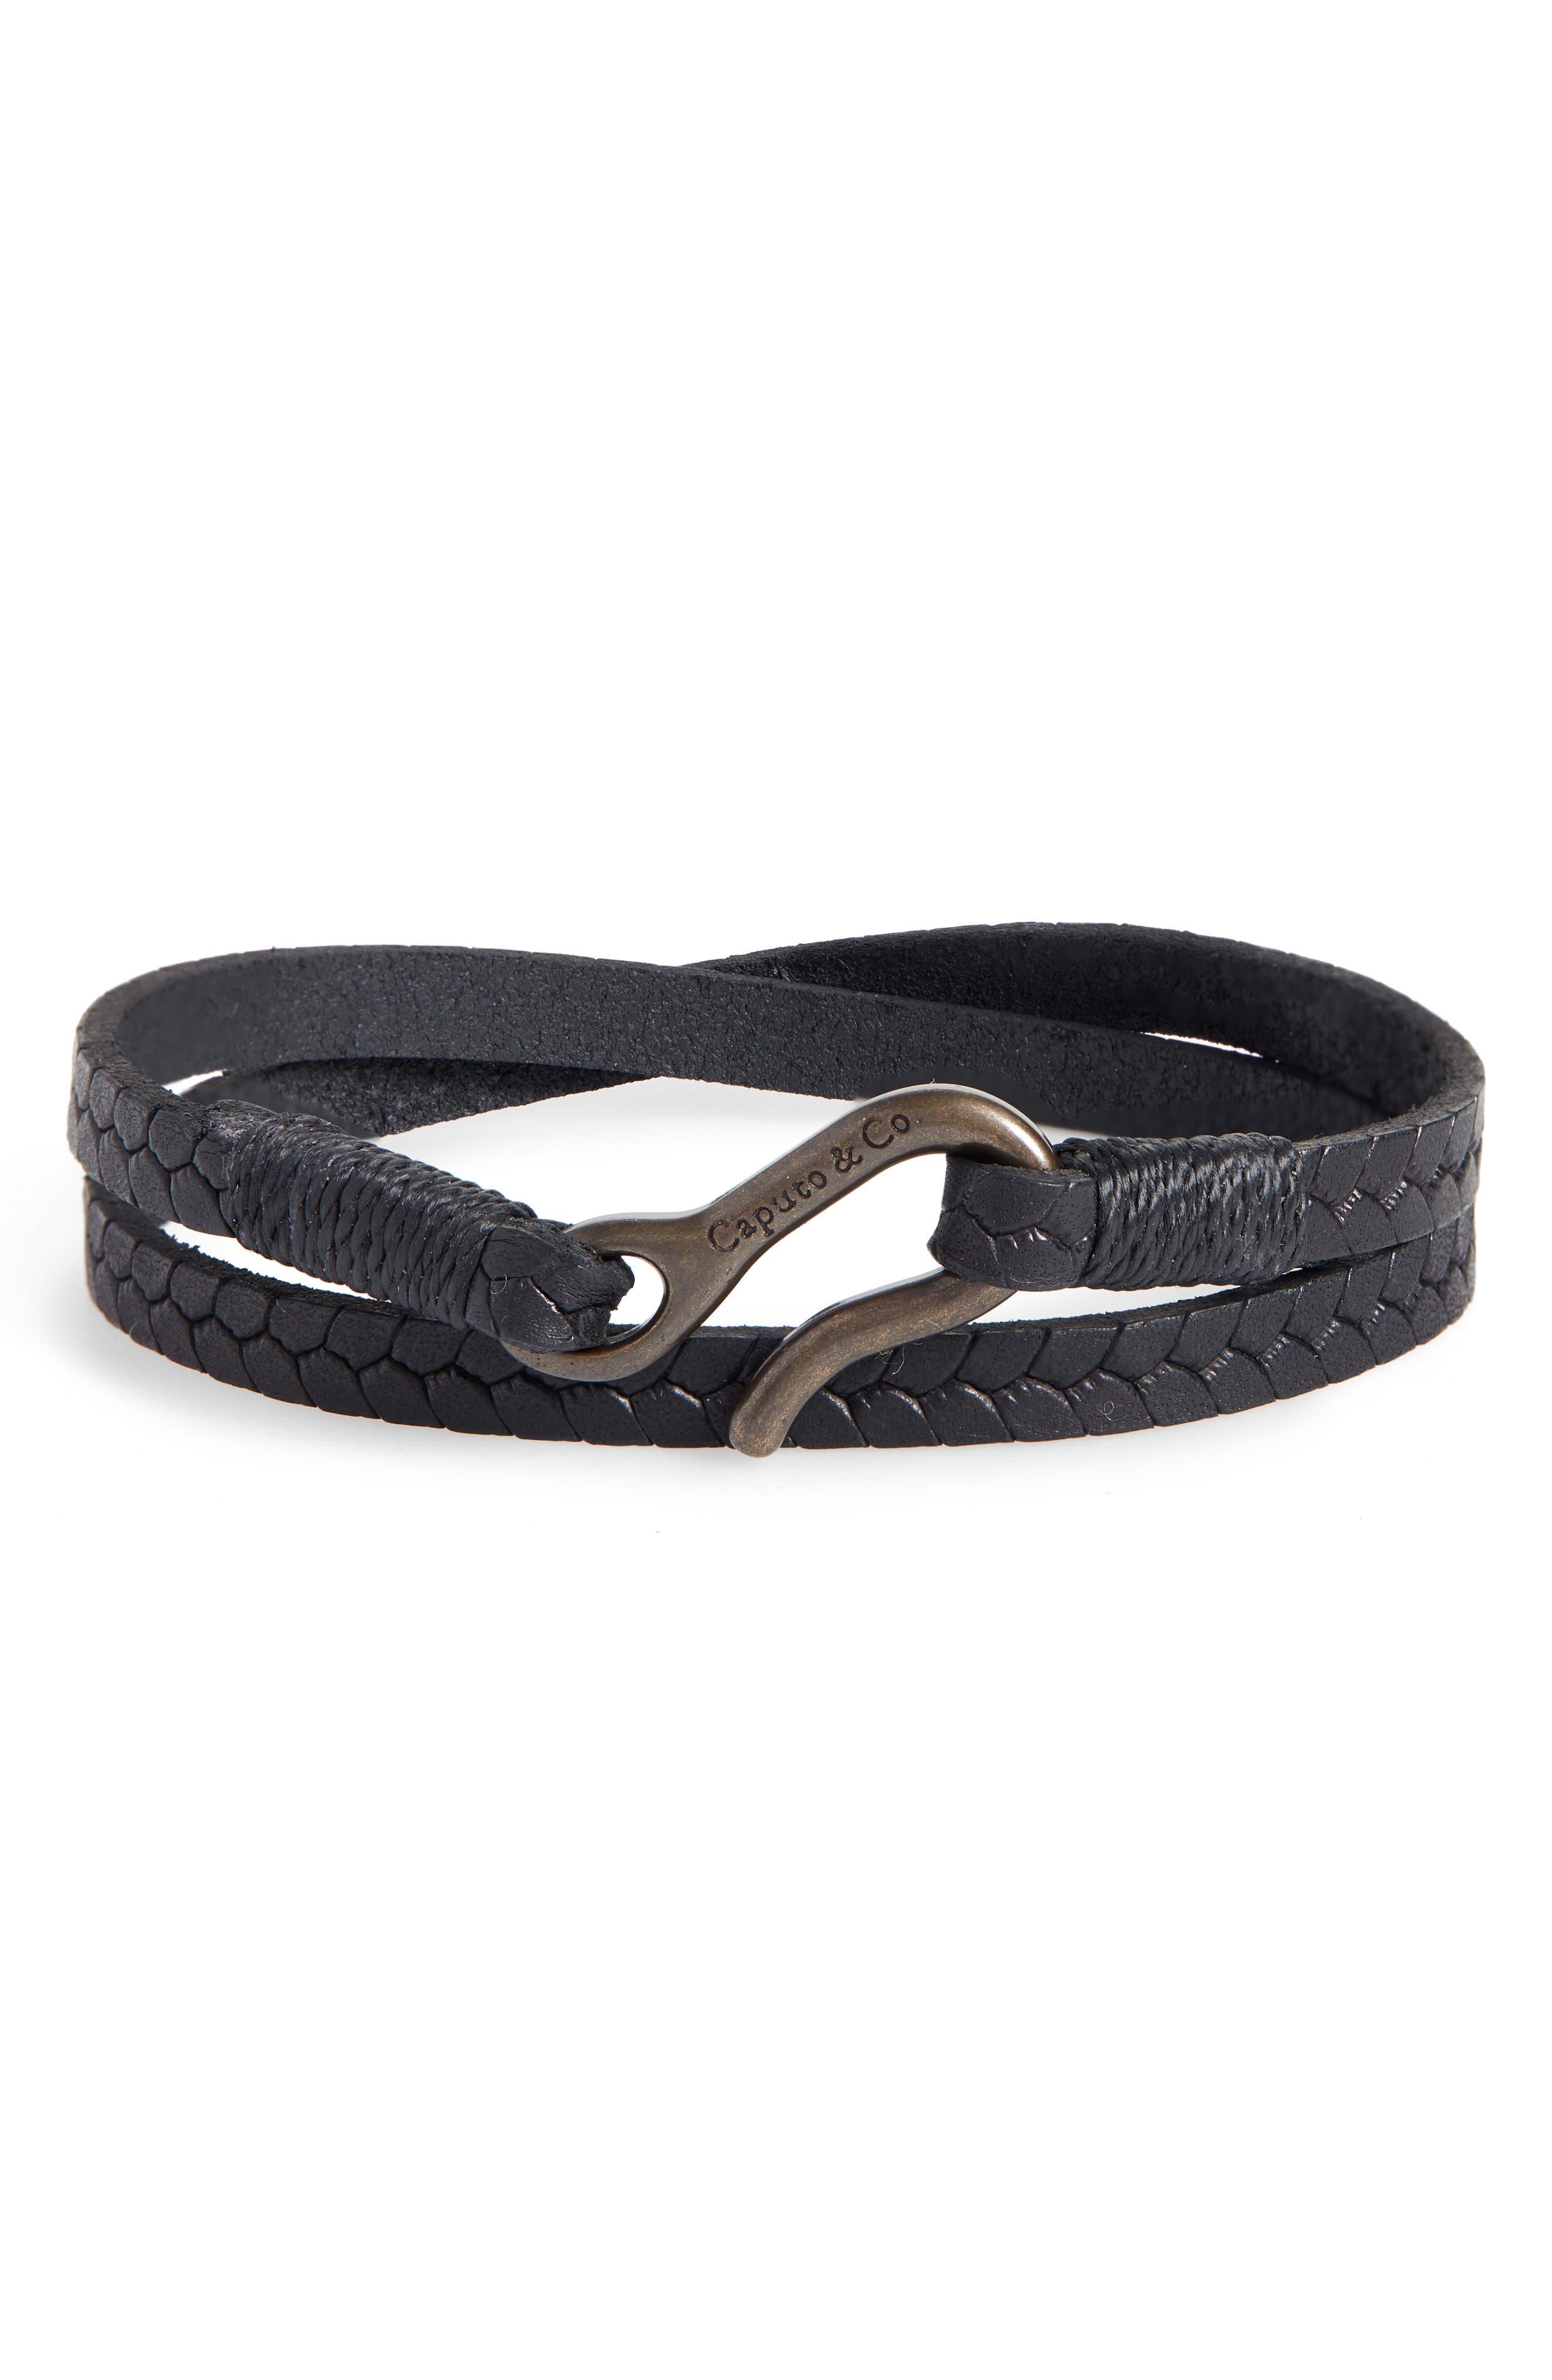 Embossed Leather Wrap Bracelet